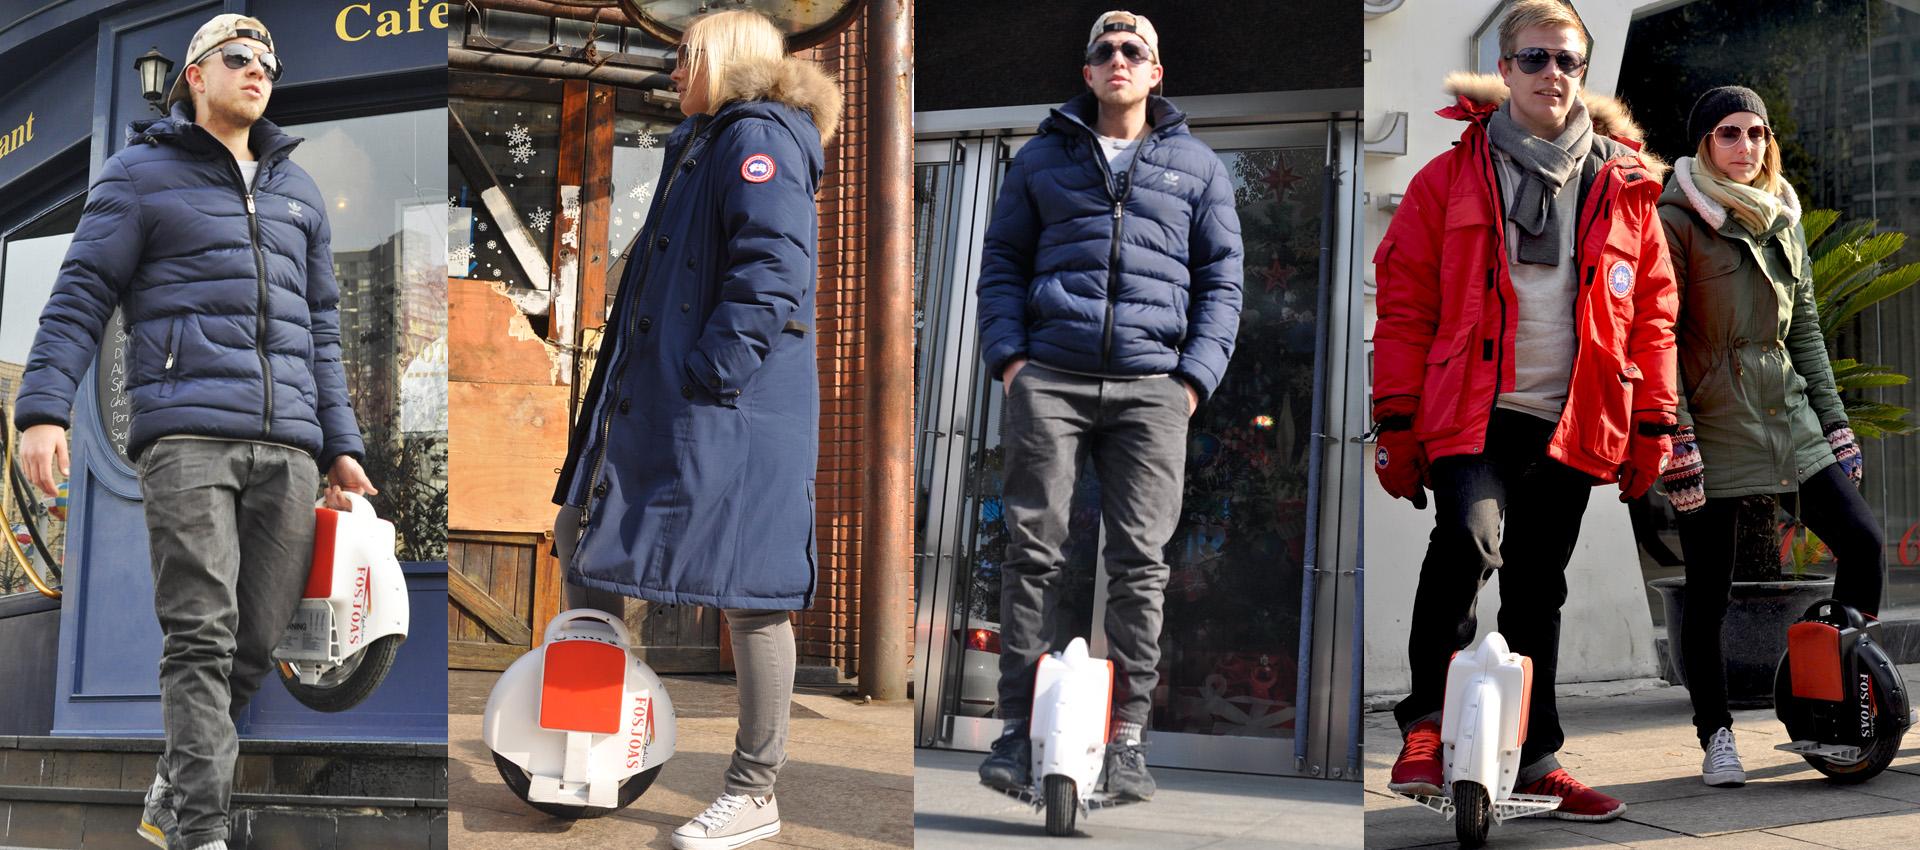 FOSJOAS Scooters Leads a Hi-tech Future